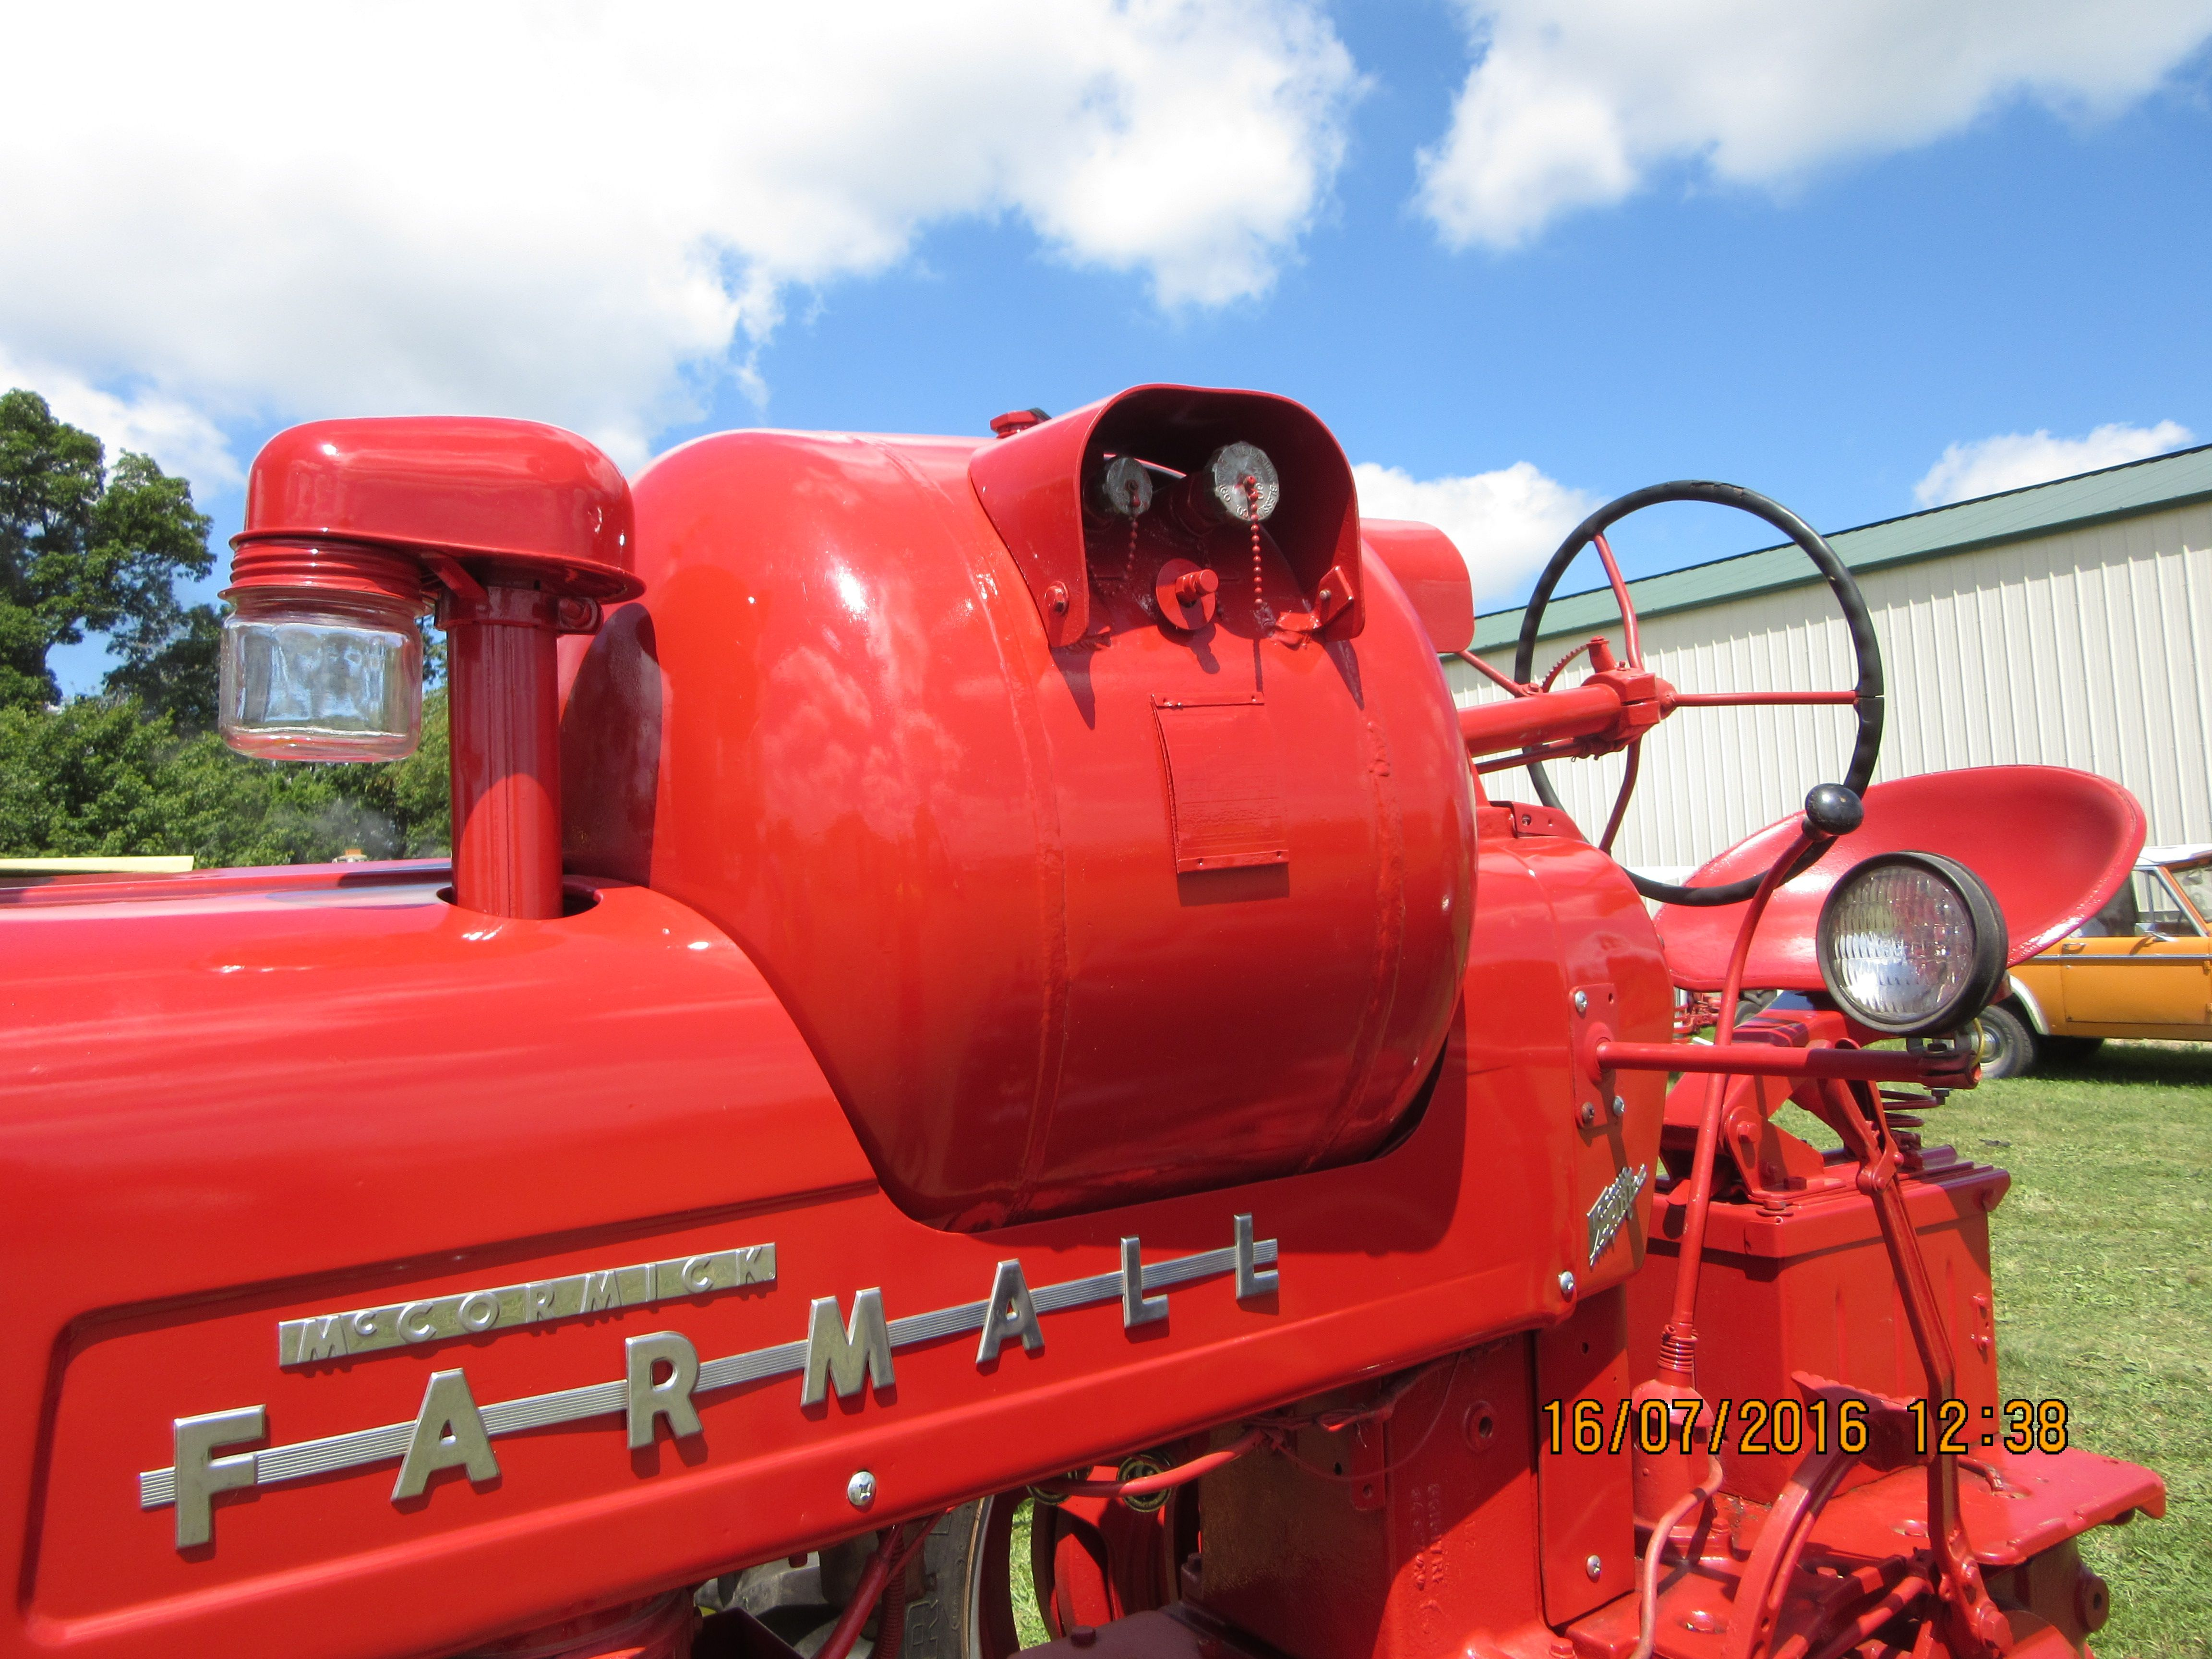 hight resolution of closeup of 1955 farmall 400 lpg red tractor tractors case ih international harvester